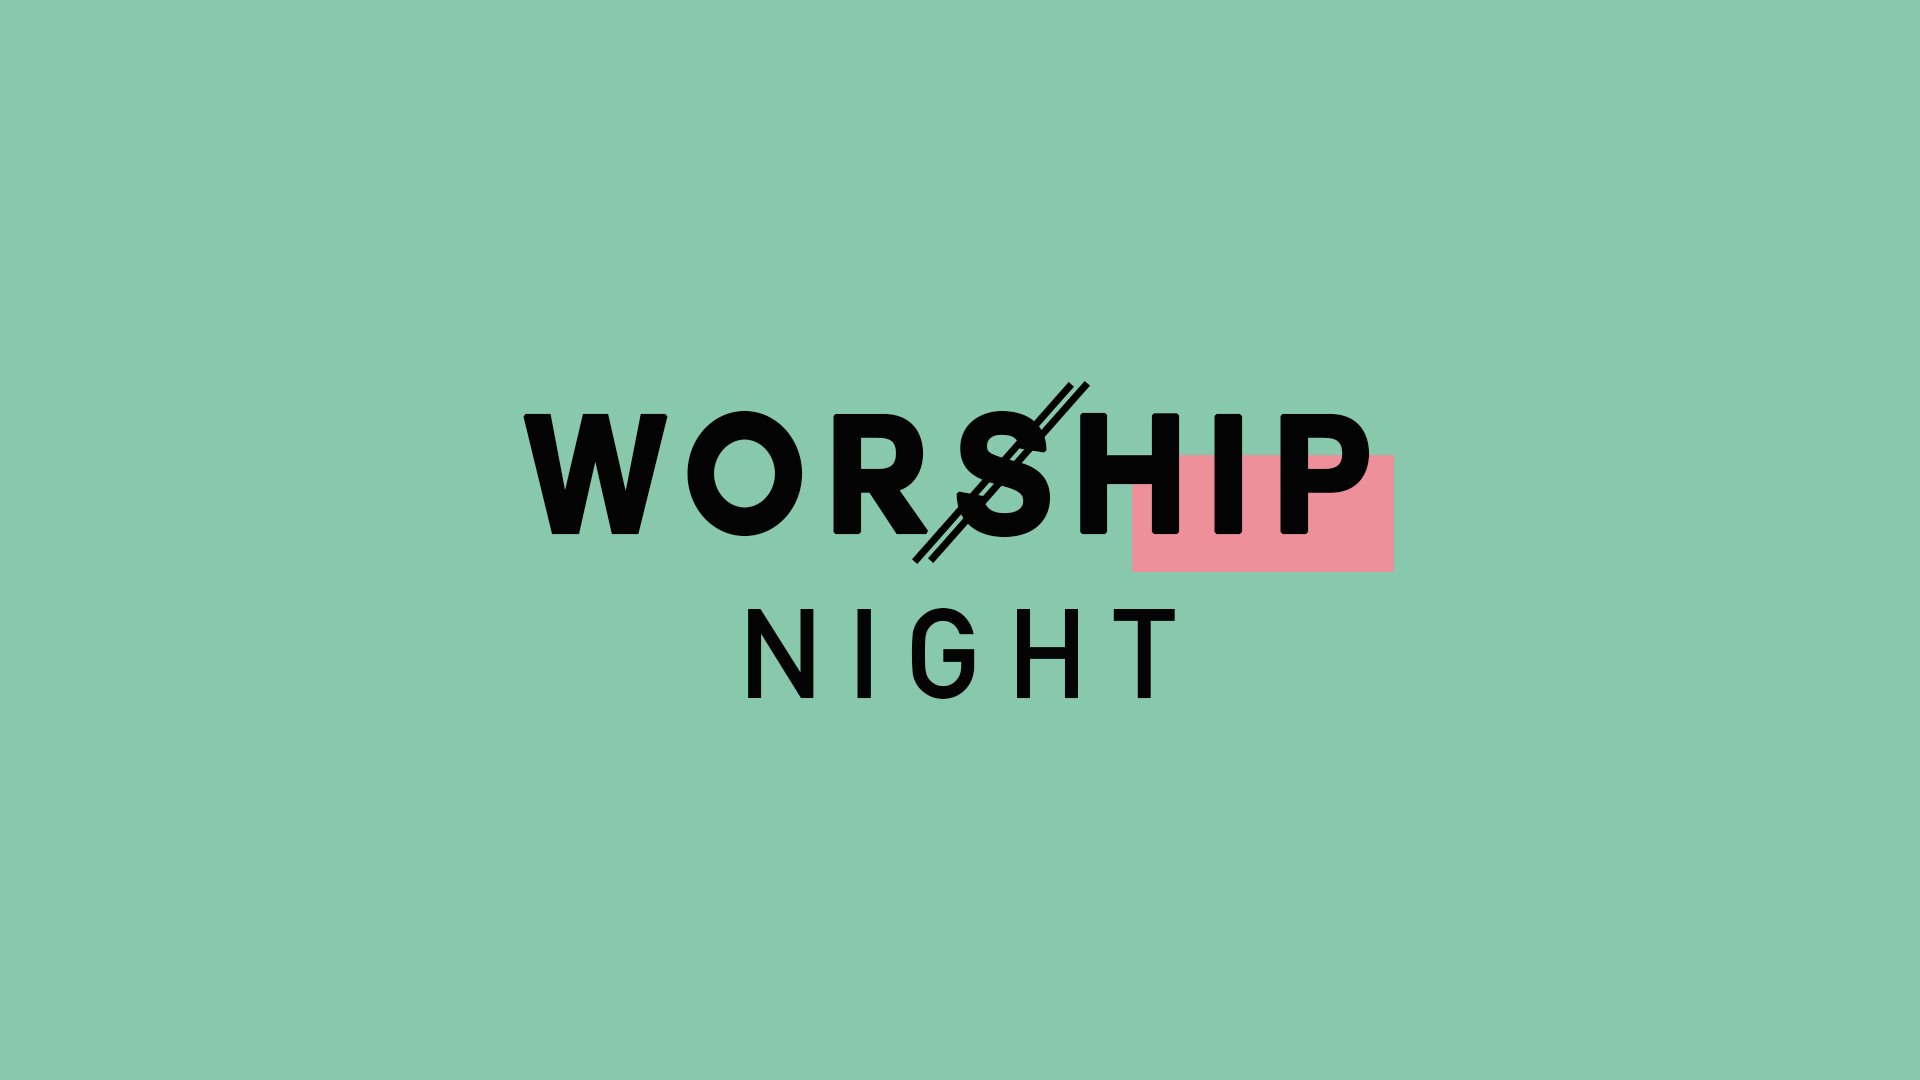 Vineyard-Church-Worship-Night.jpg